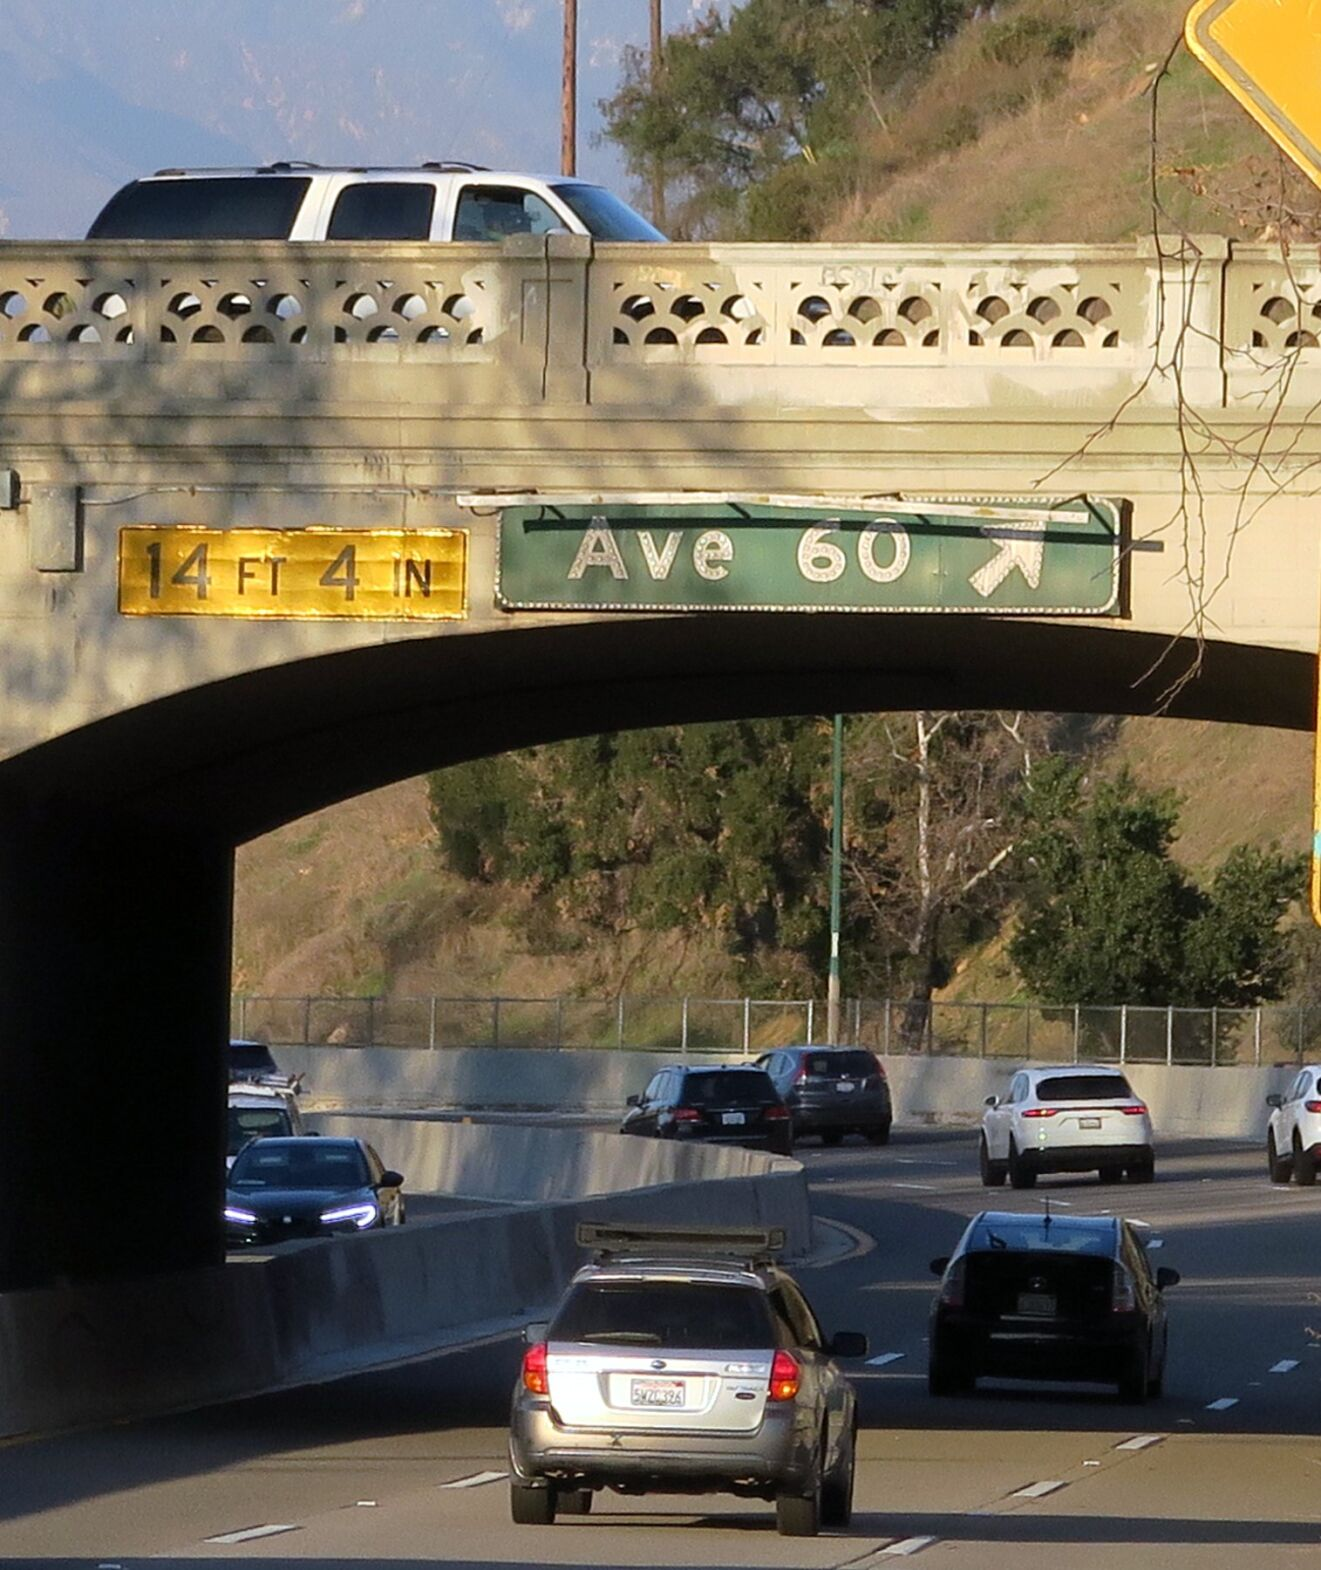 Avenue 60 exit sign